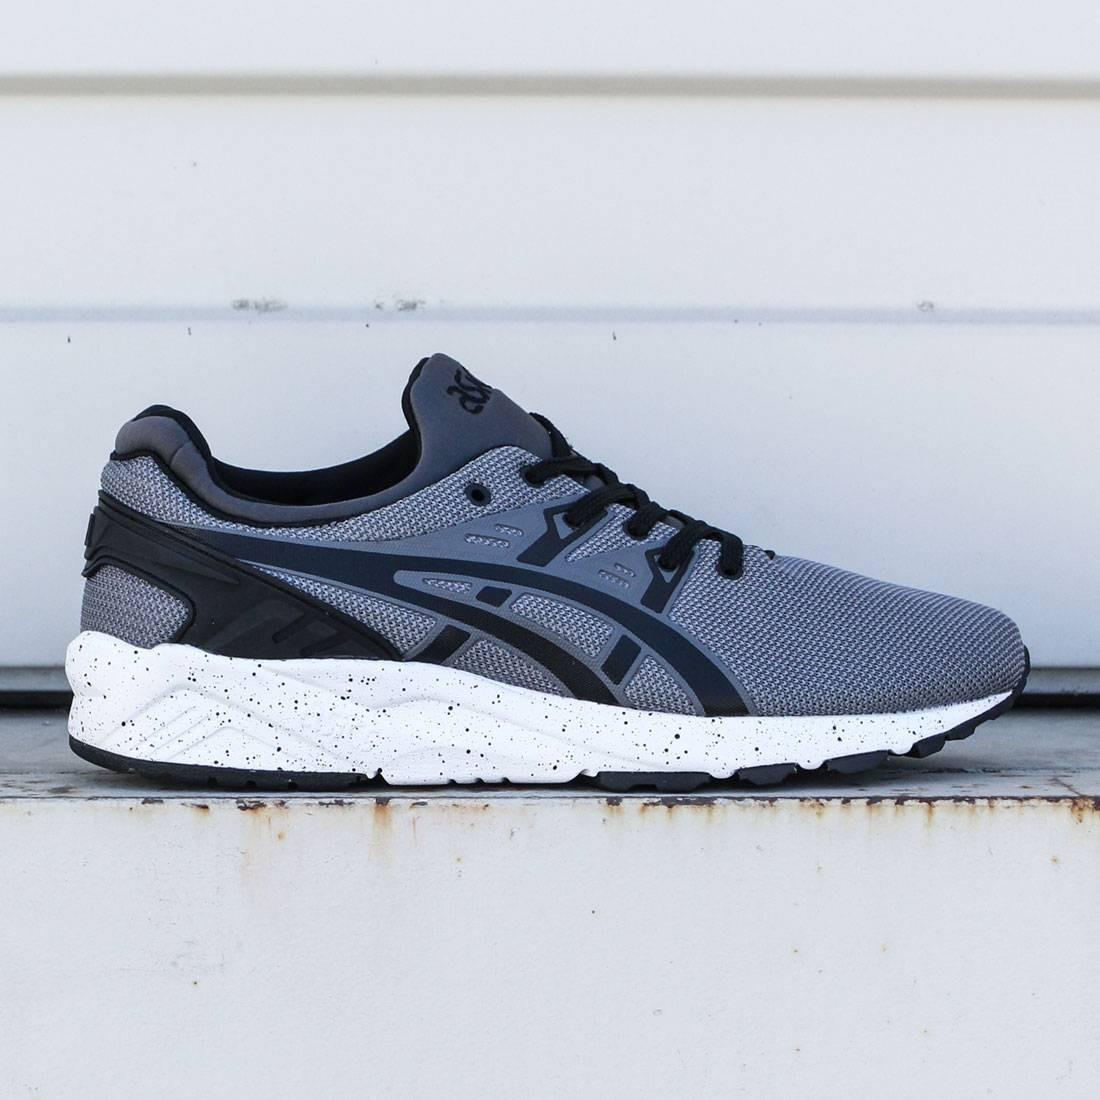 sports shoes 2facf 54b9c Asics Tiger Men Gel-Kayano Trainer EVO (gray / black)